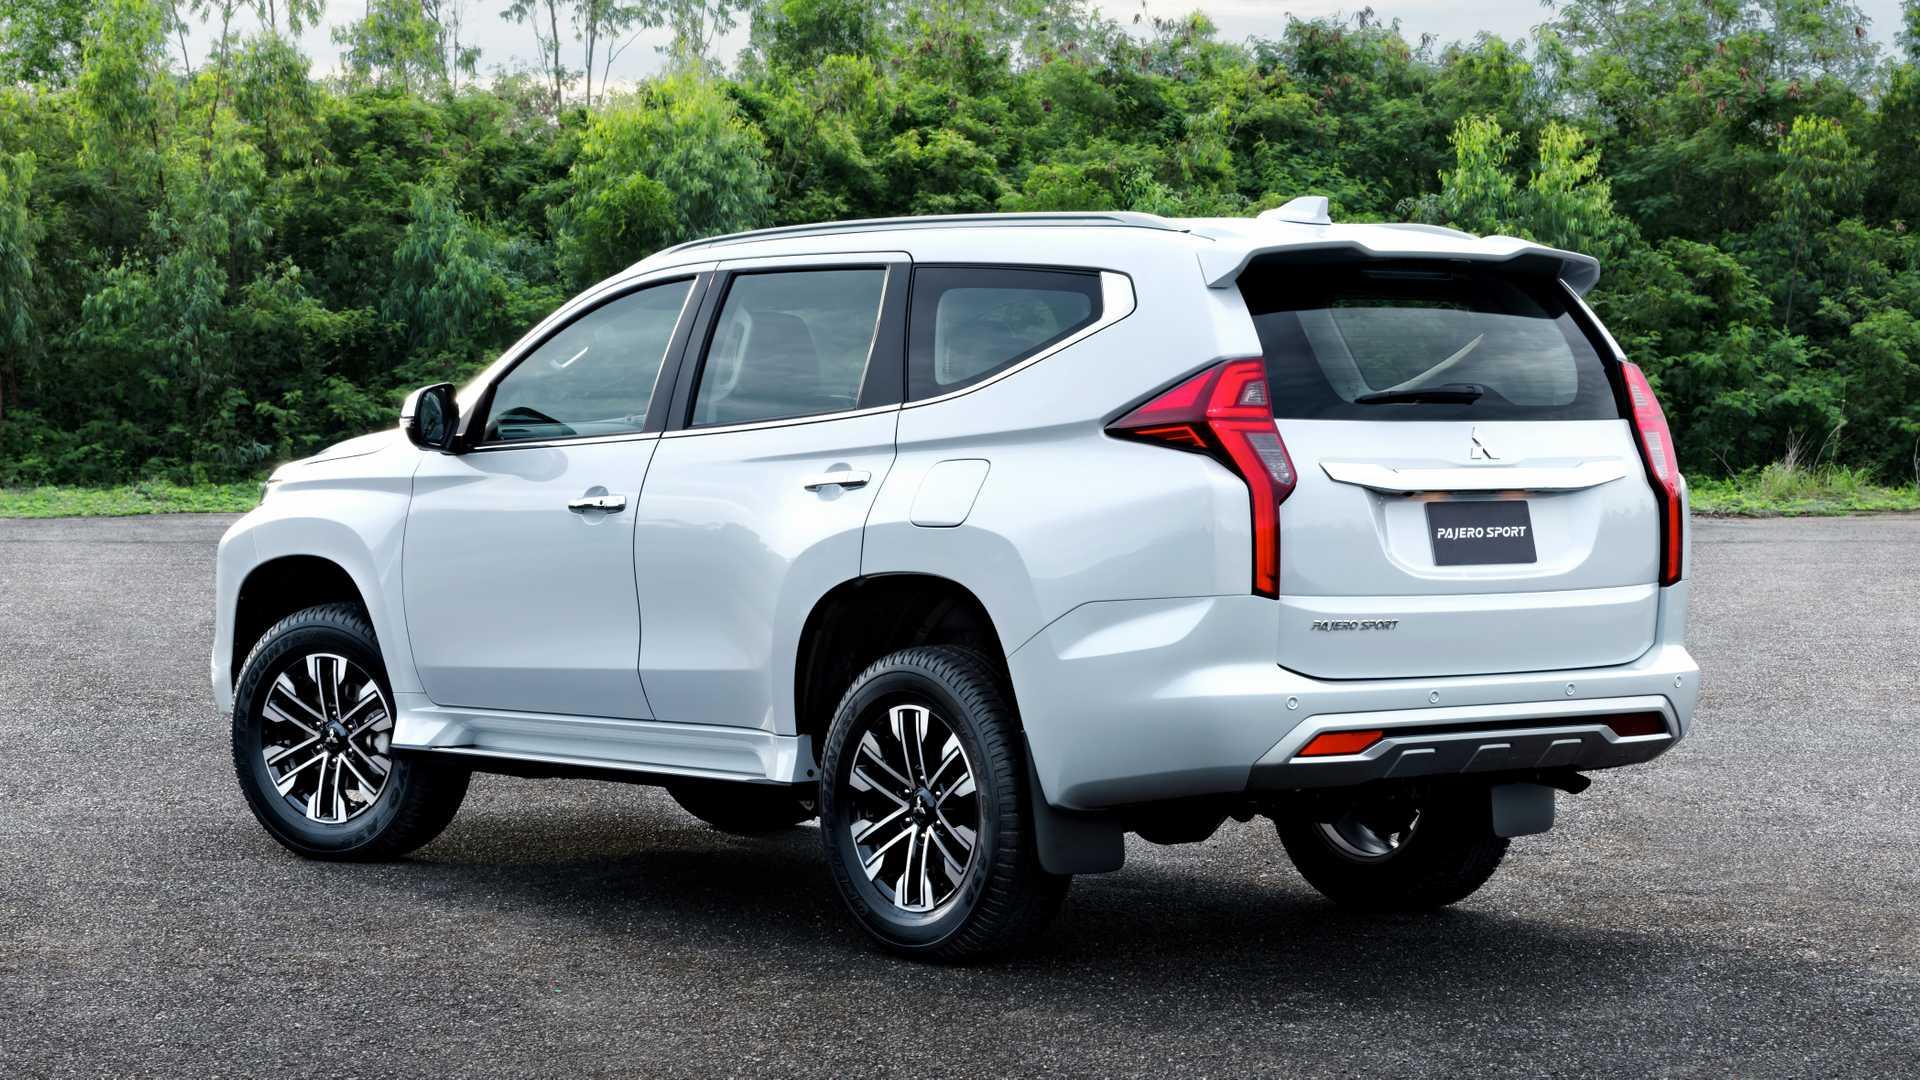 2020_Mitsubishi_Pajero_Sport_facelift_0016